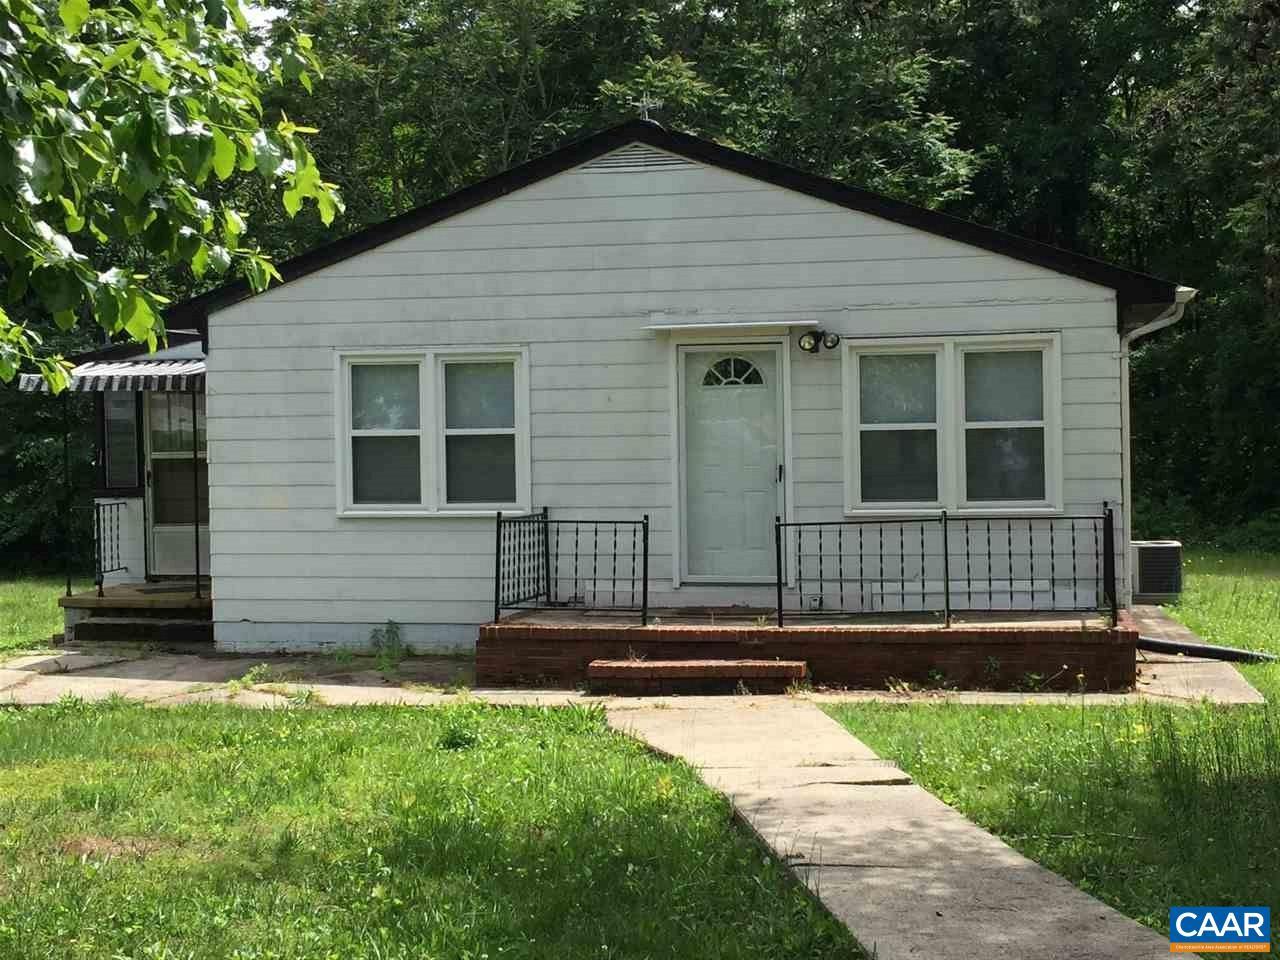 1846 MALLORY RD, KENTS STORE, VA 23084